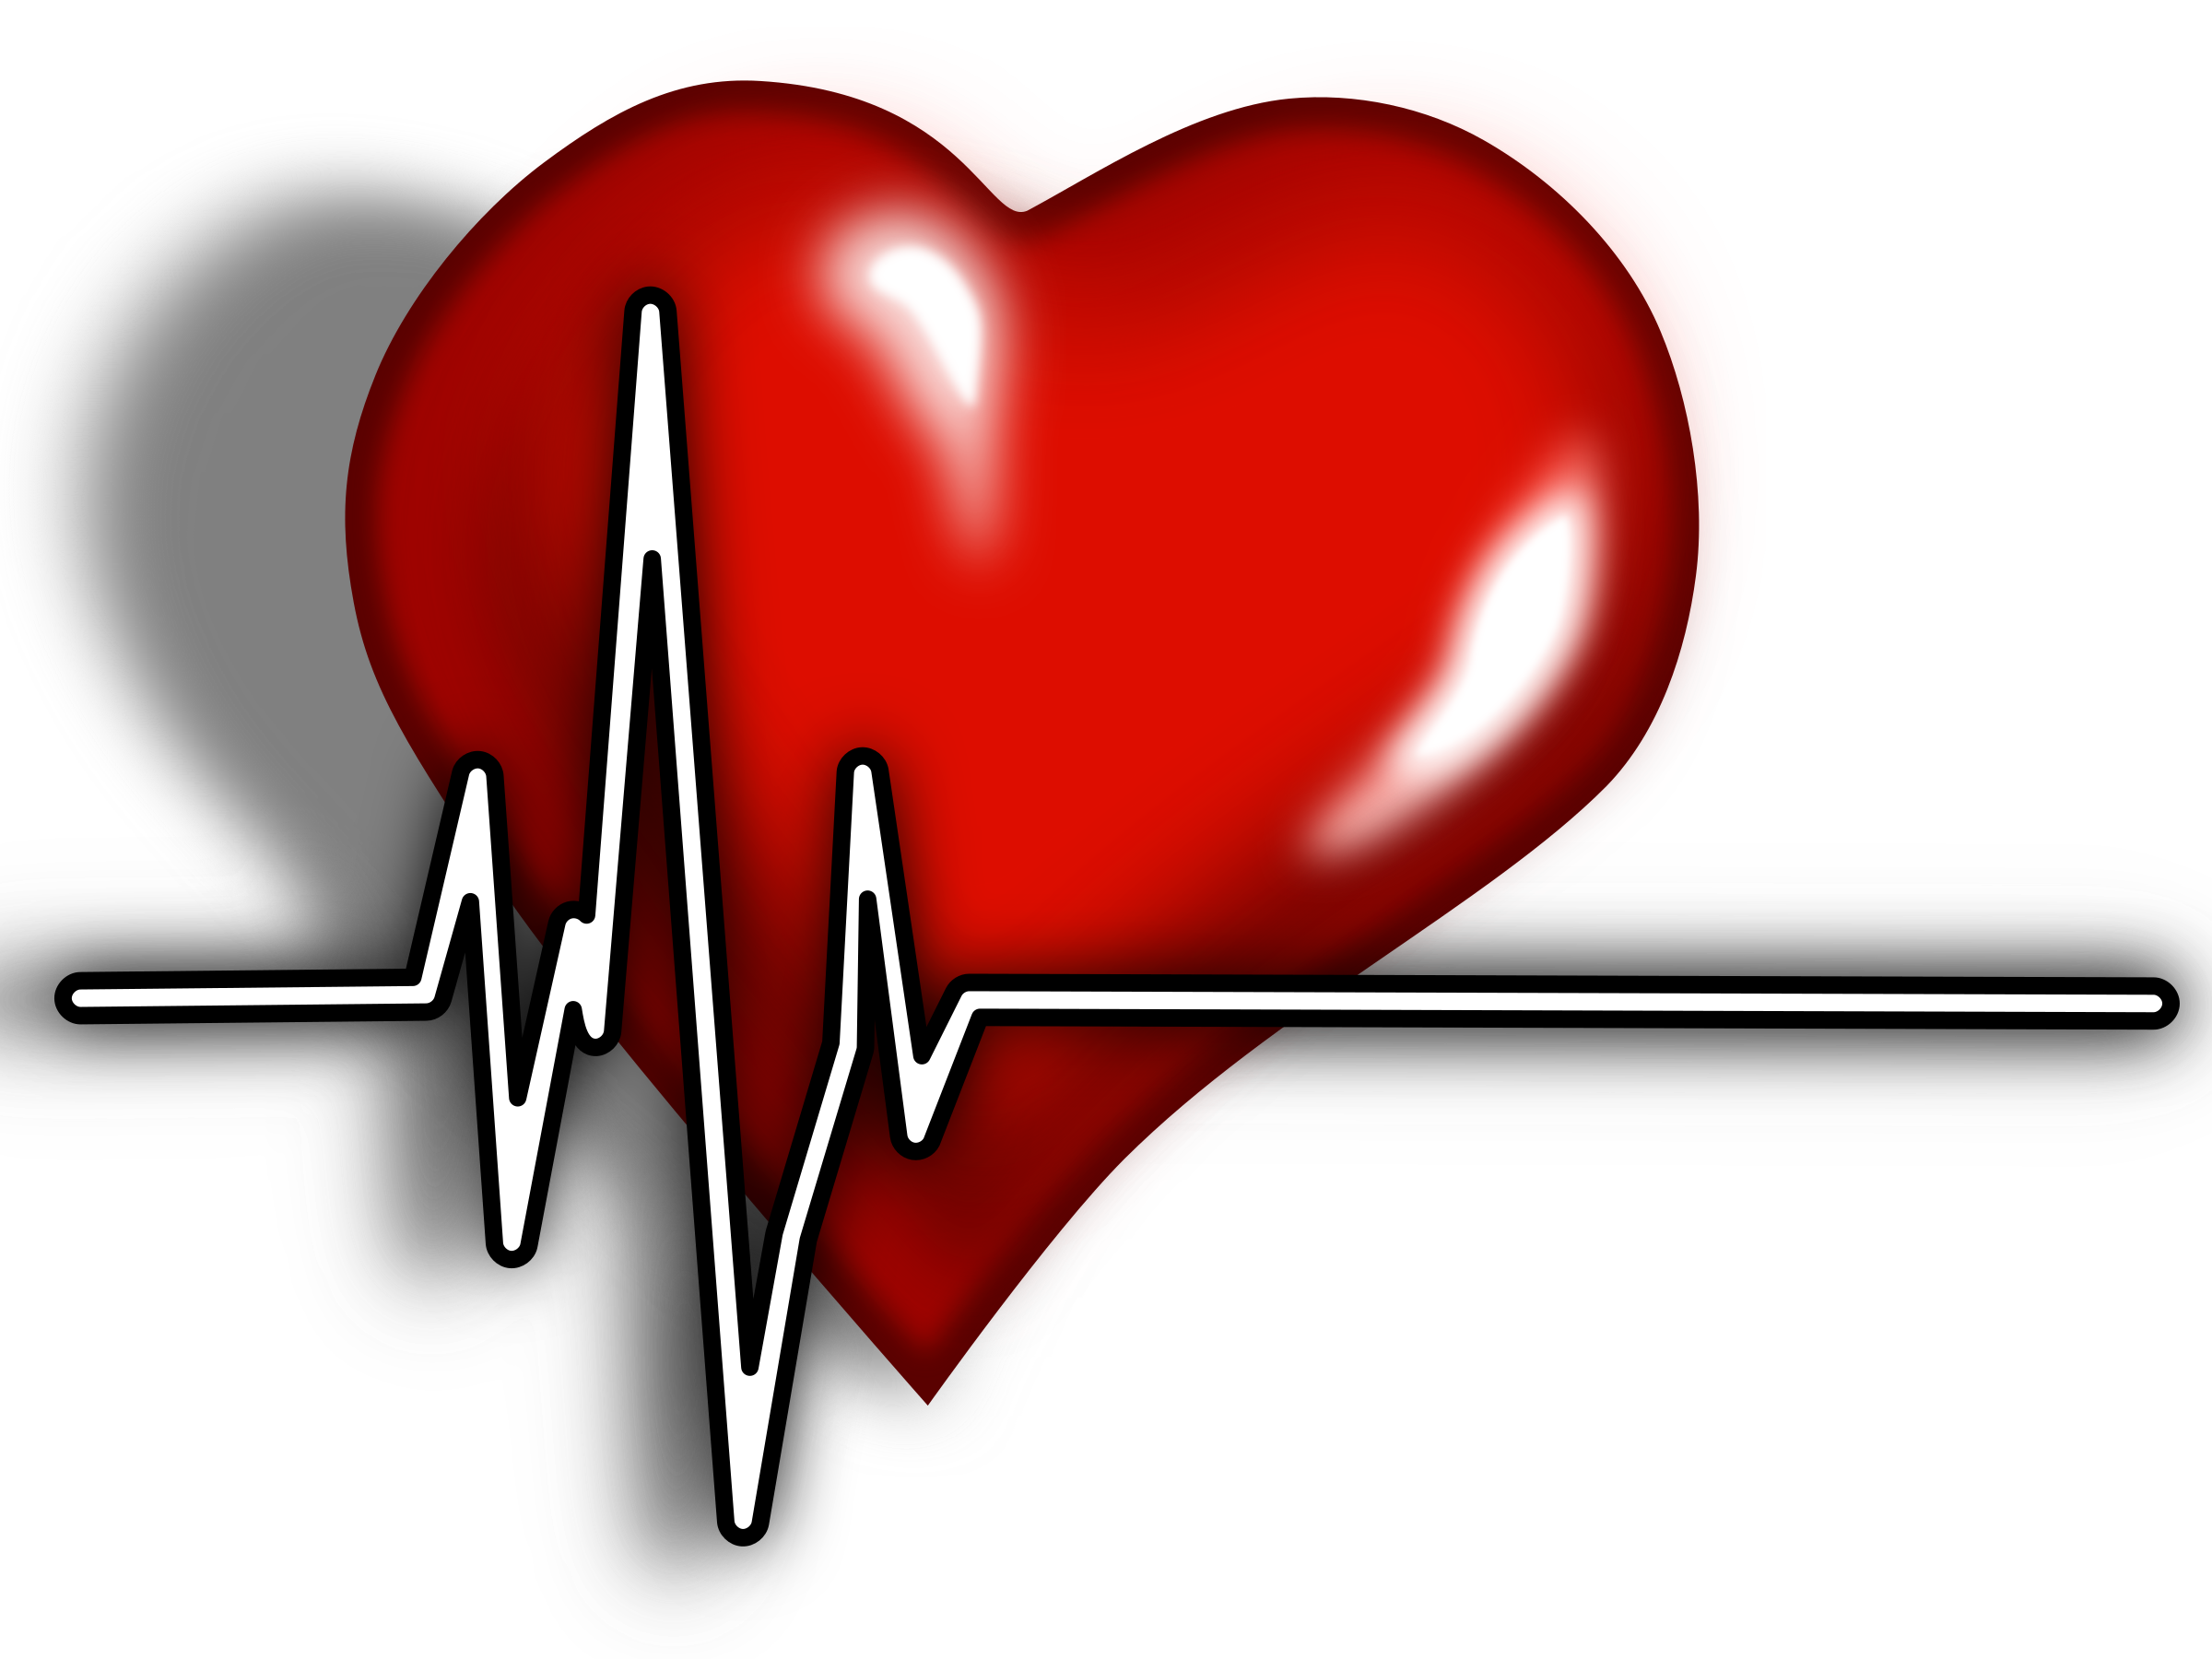 Heart ecg logo big. Heartbeat clipart telemetry